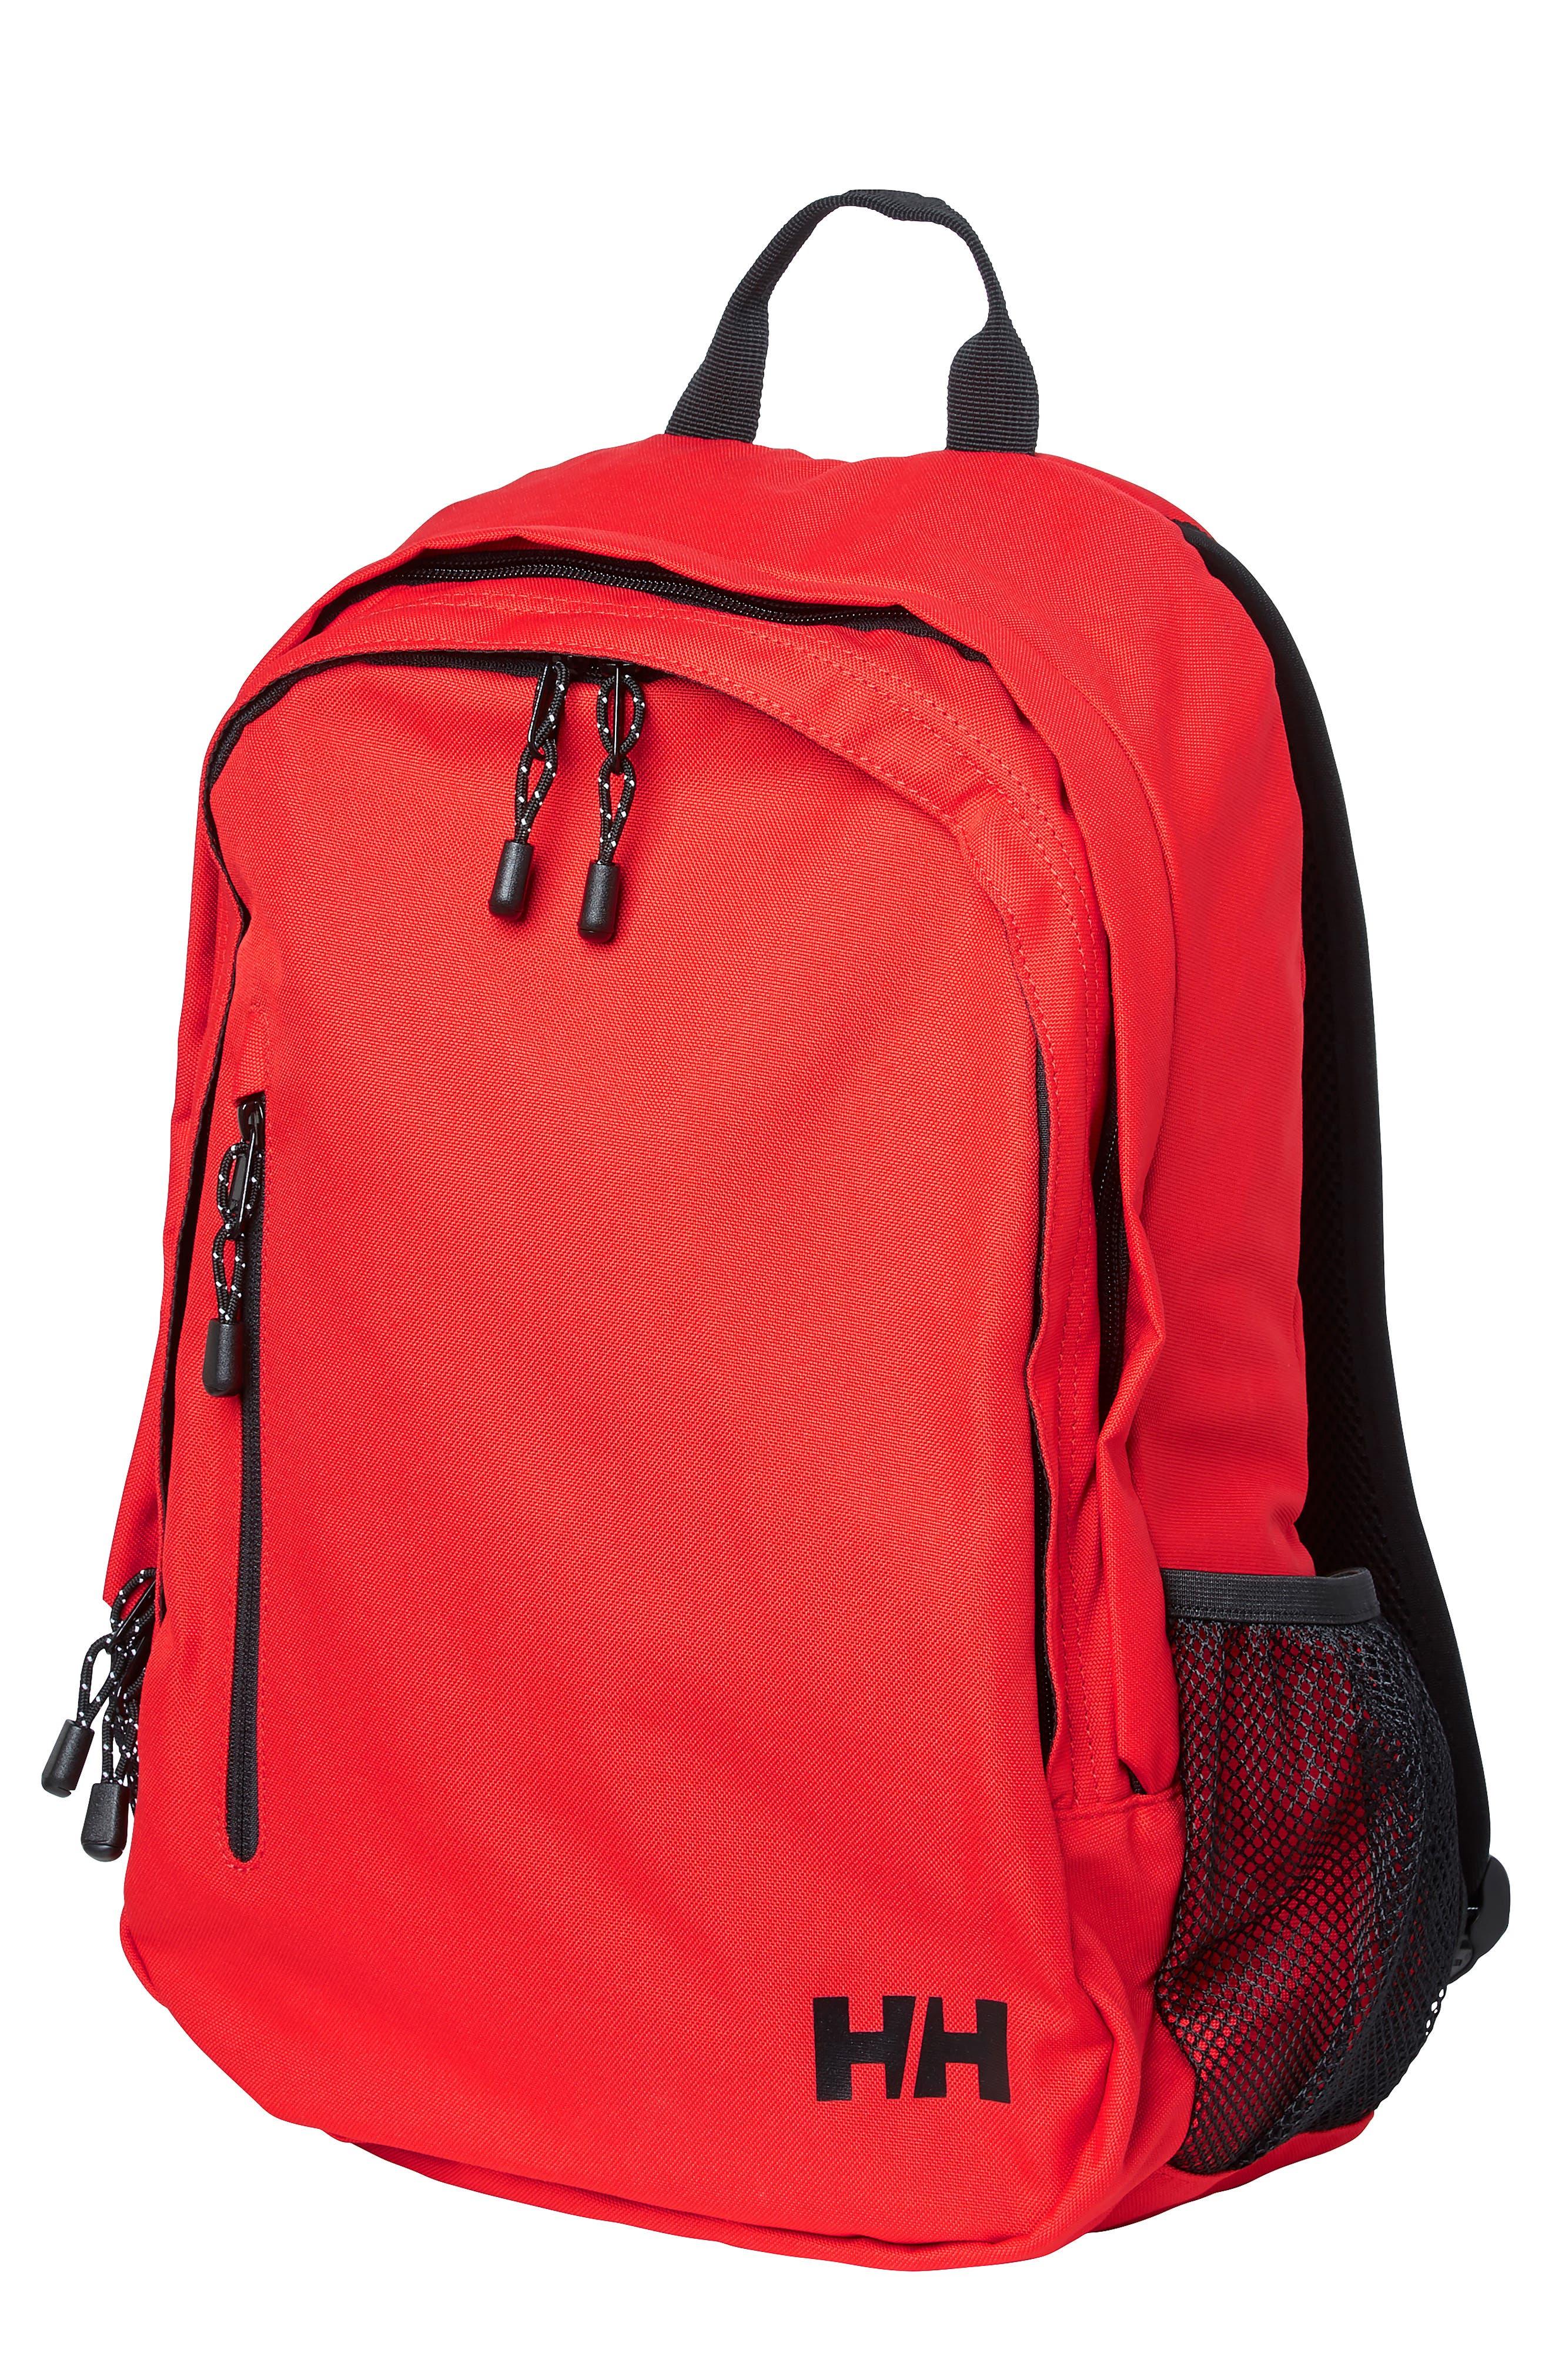 HELLY HANSEN Dublin Backpack - Red in Alert Red